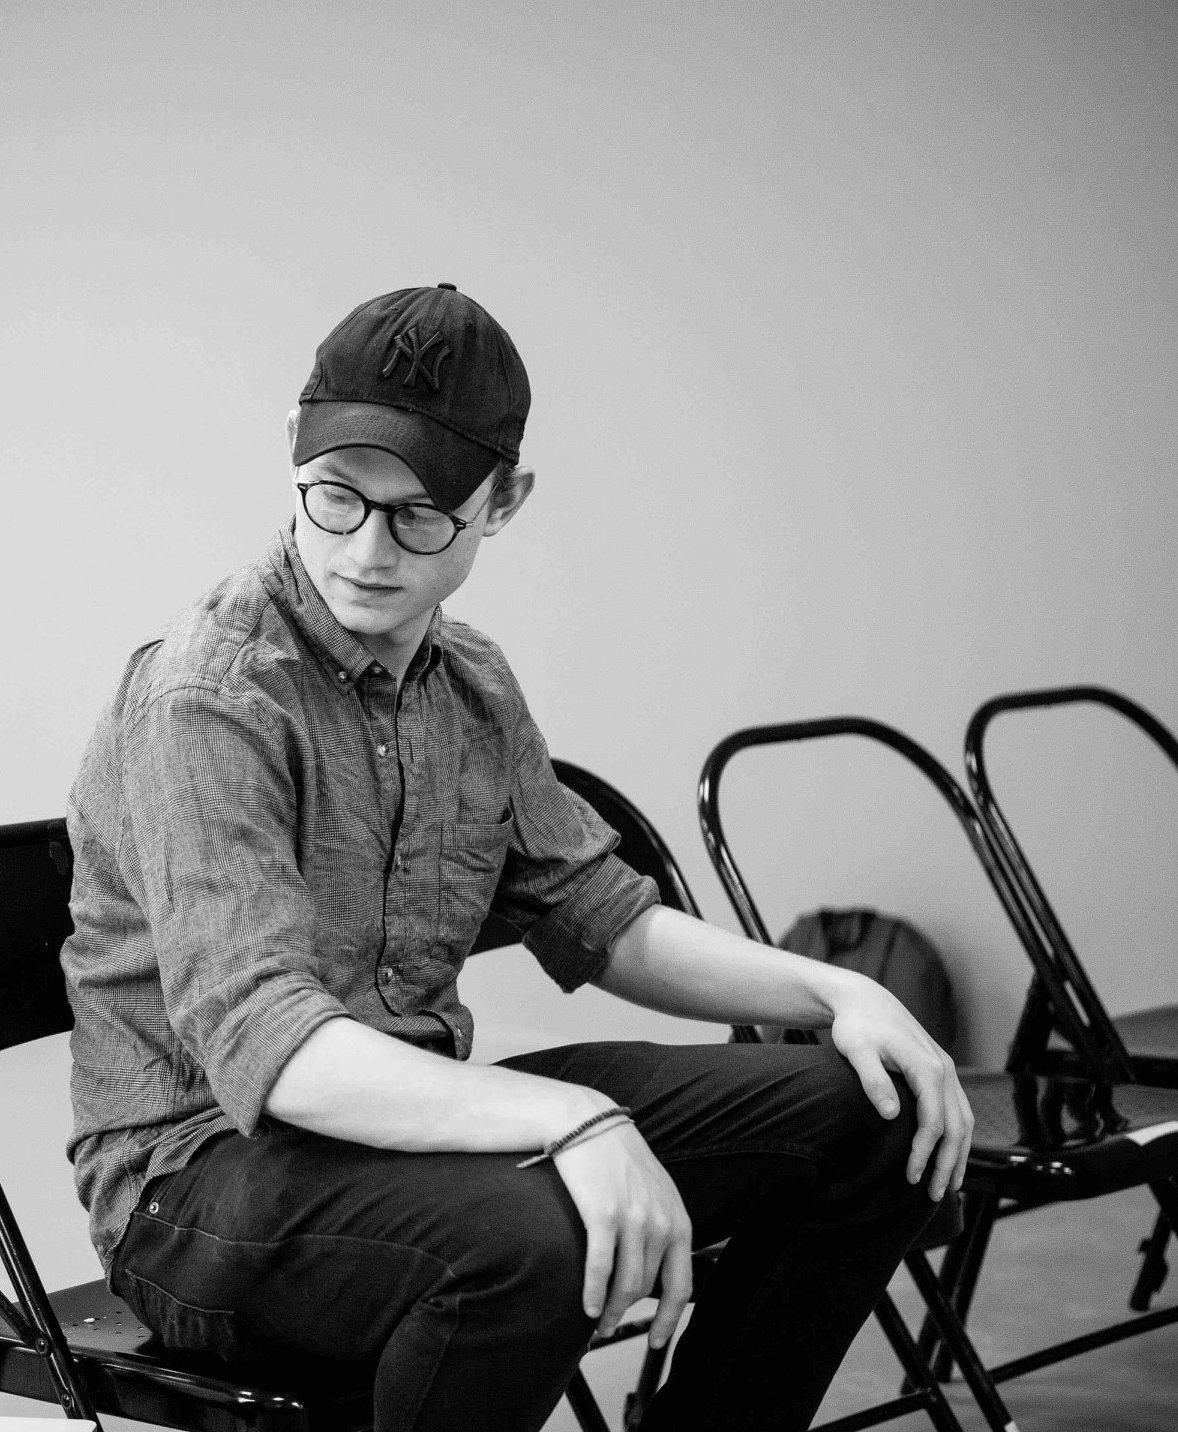 jolley directing.jpg